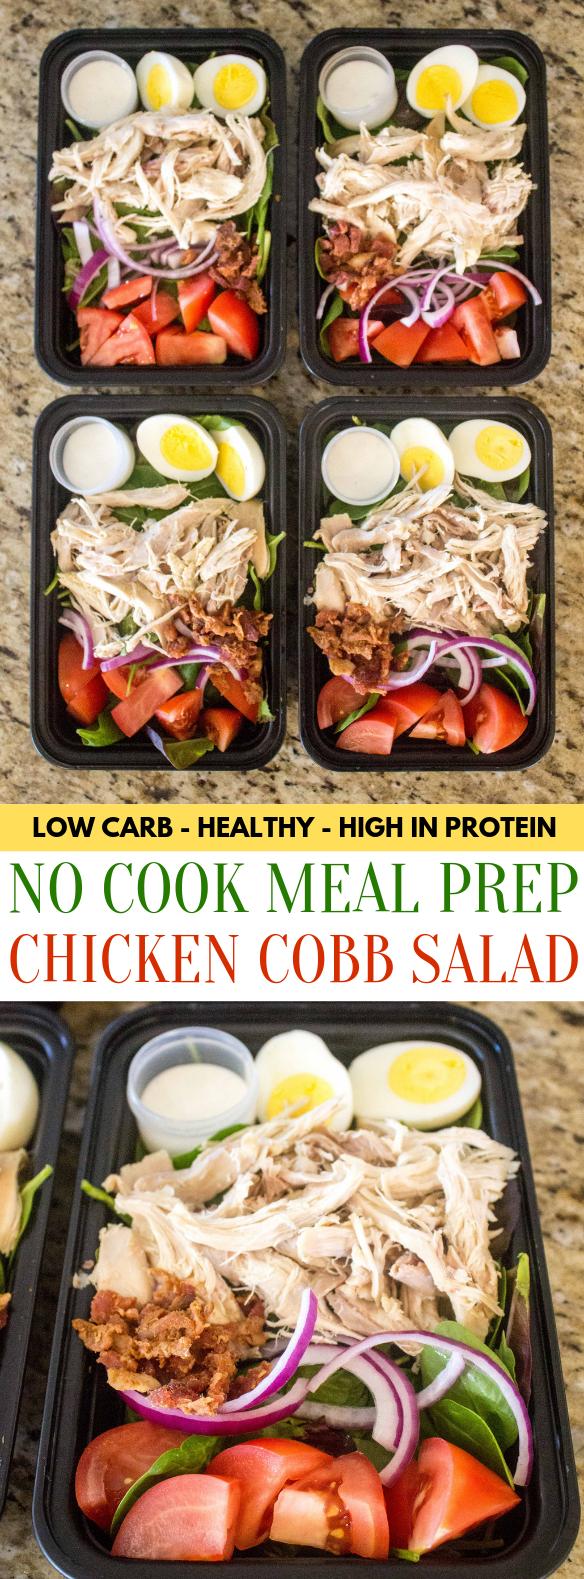 No Cook Meal Prep Chicken Cobb Salad No Cook Meal Prep Chicken Cobb Salad